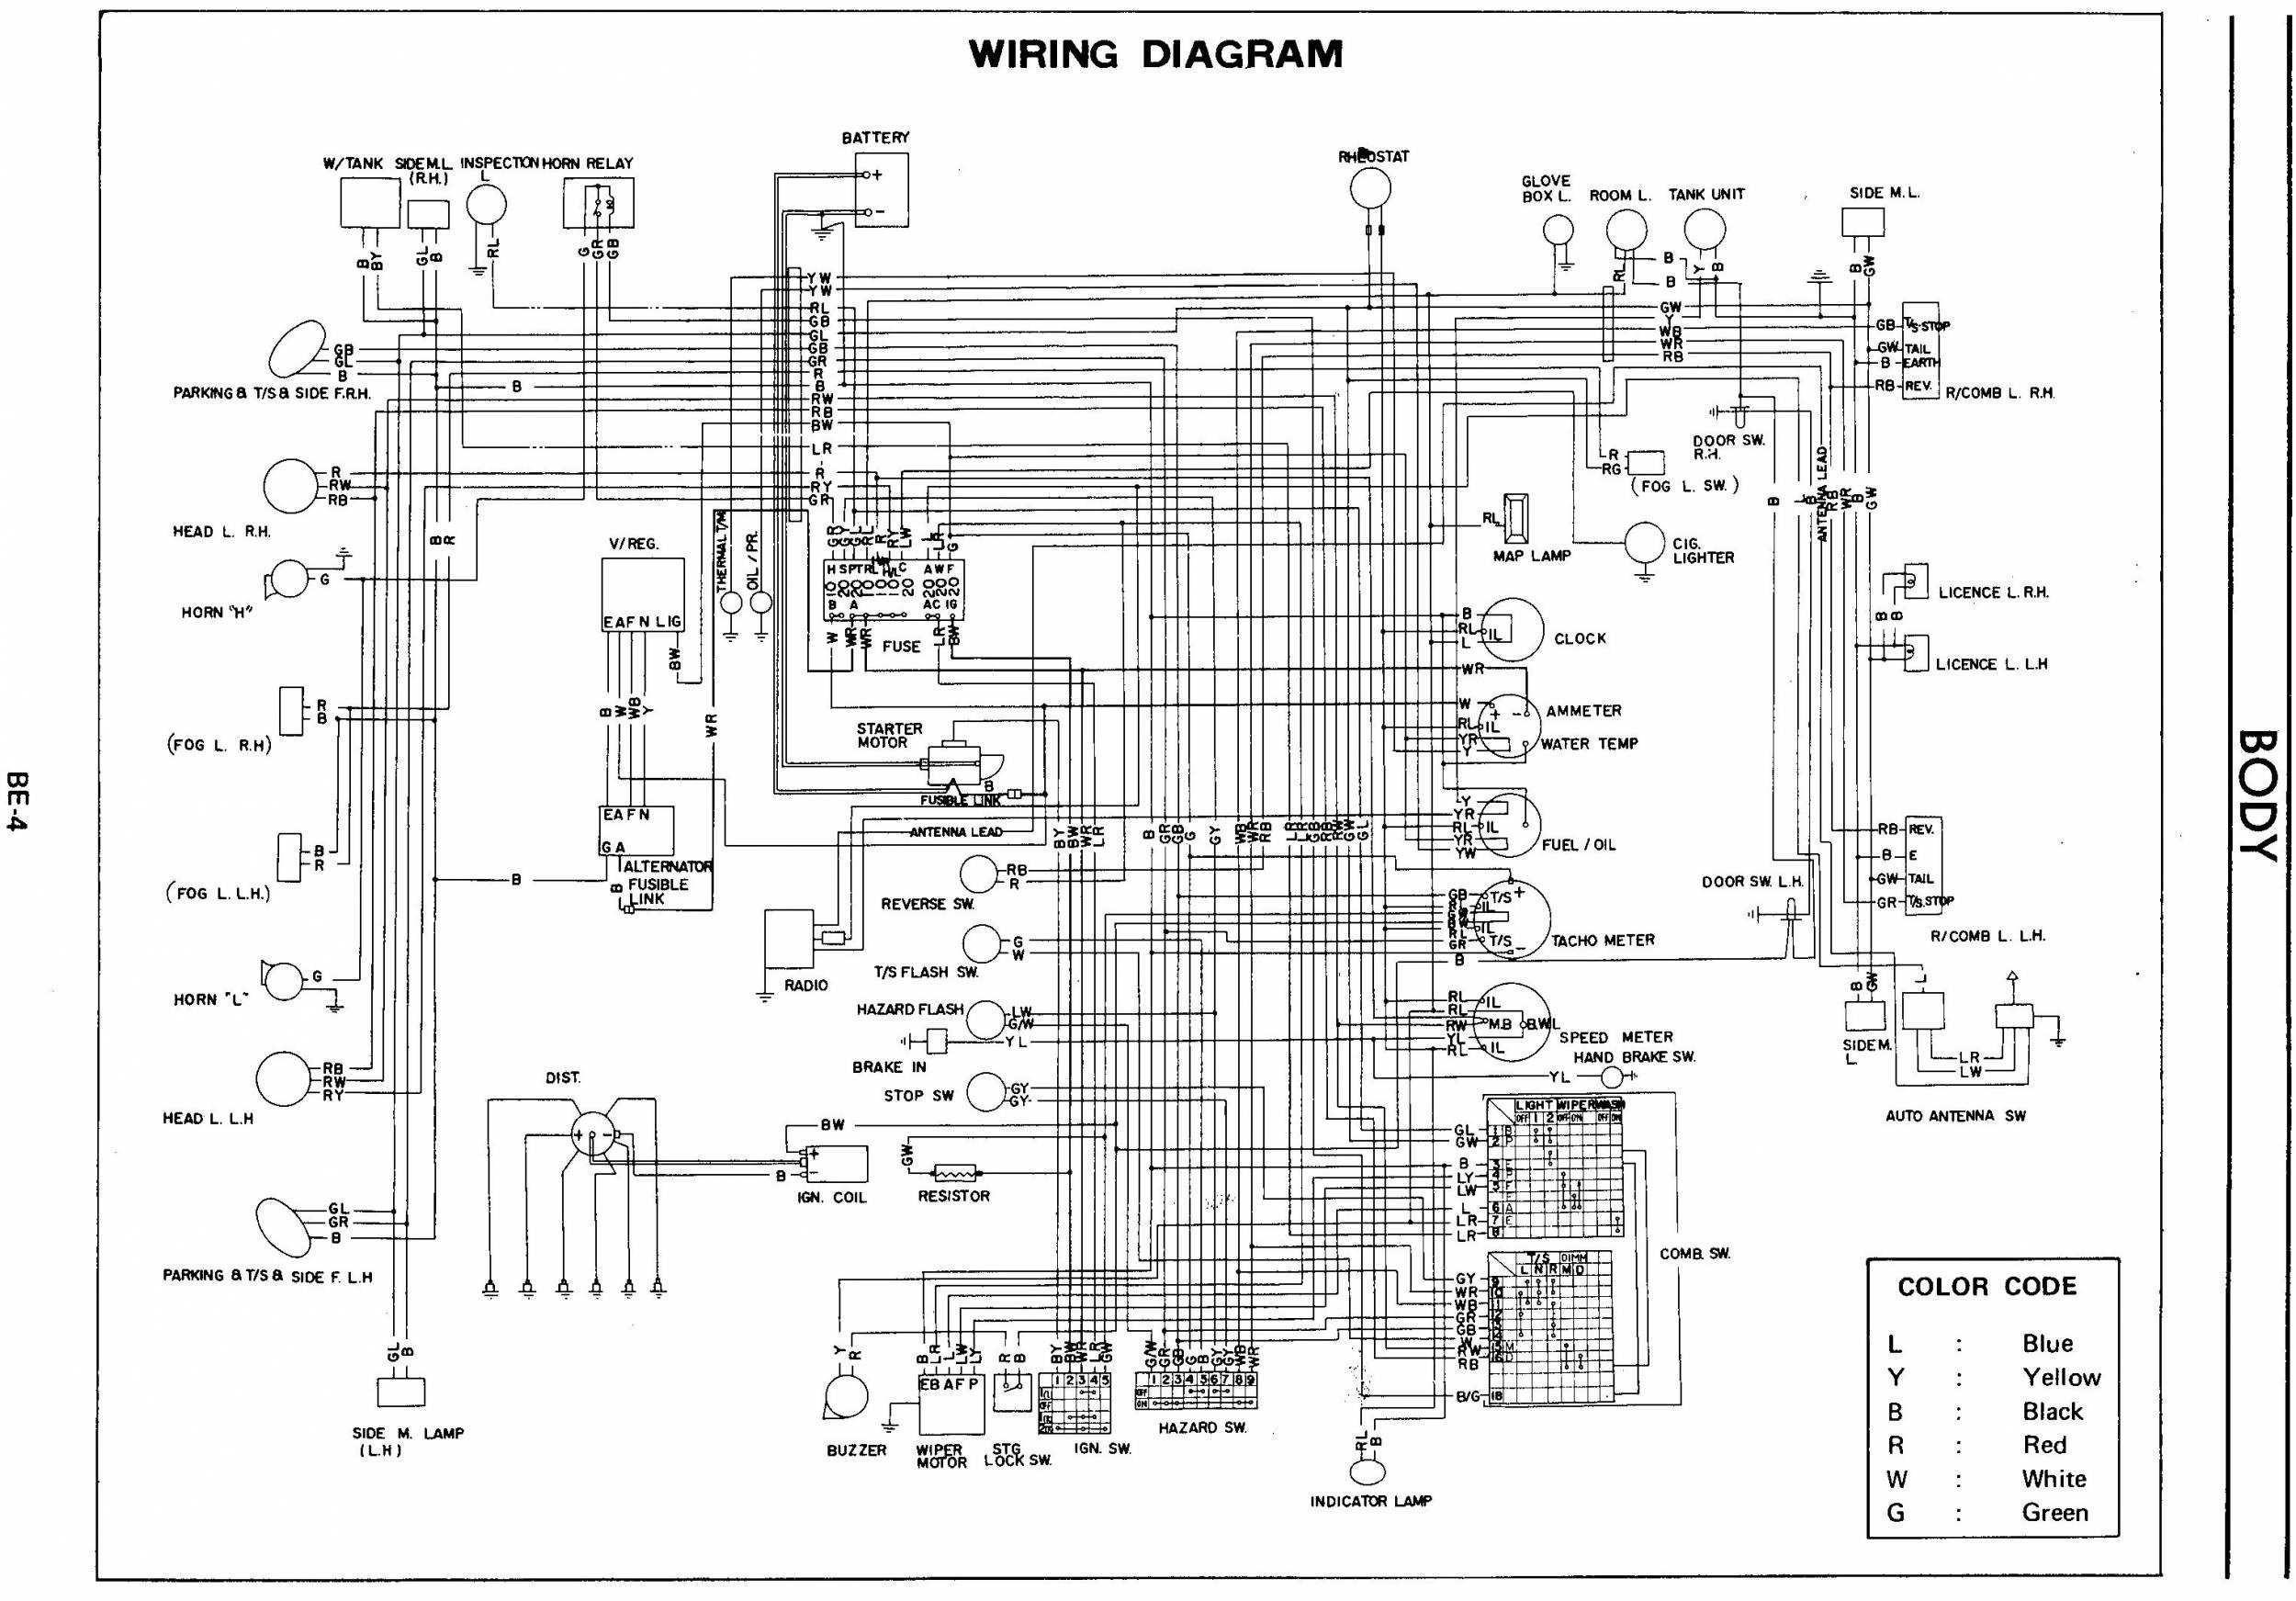 Ml320 Engine Diagram Mercedes Ml320 Engine Diagram Wiring Diagrams Konsult